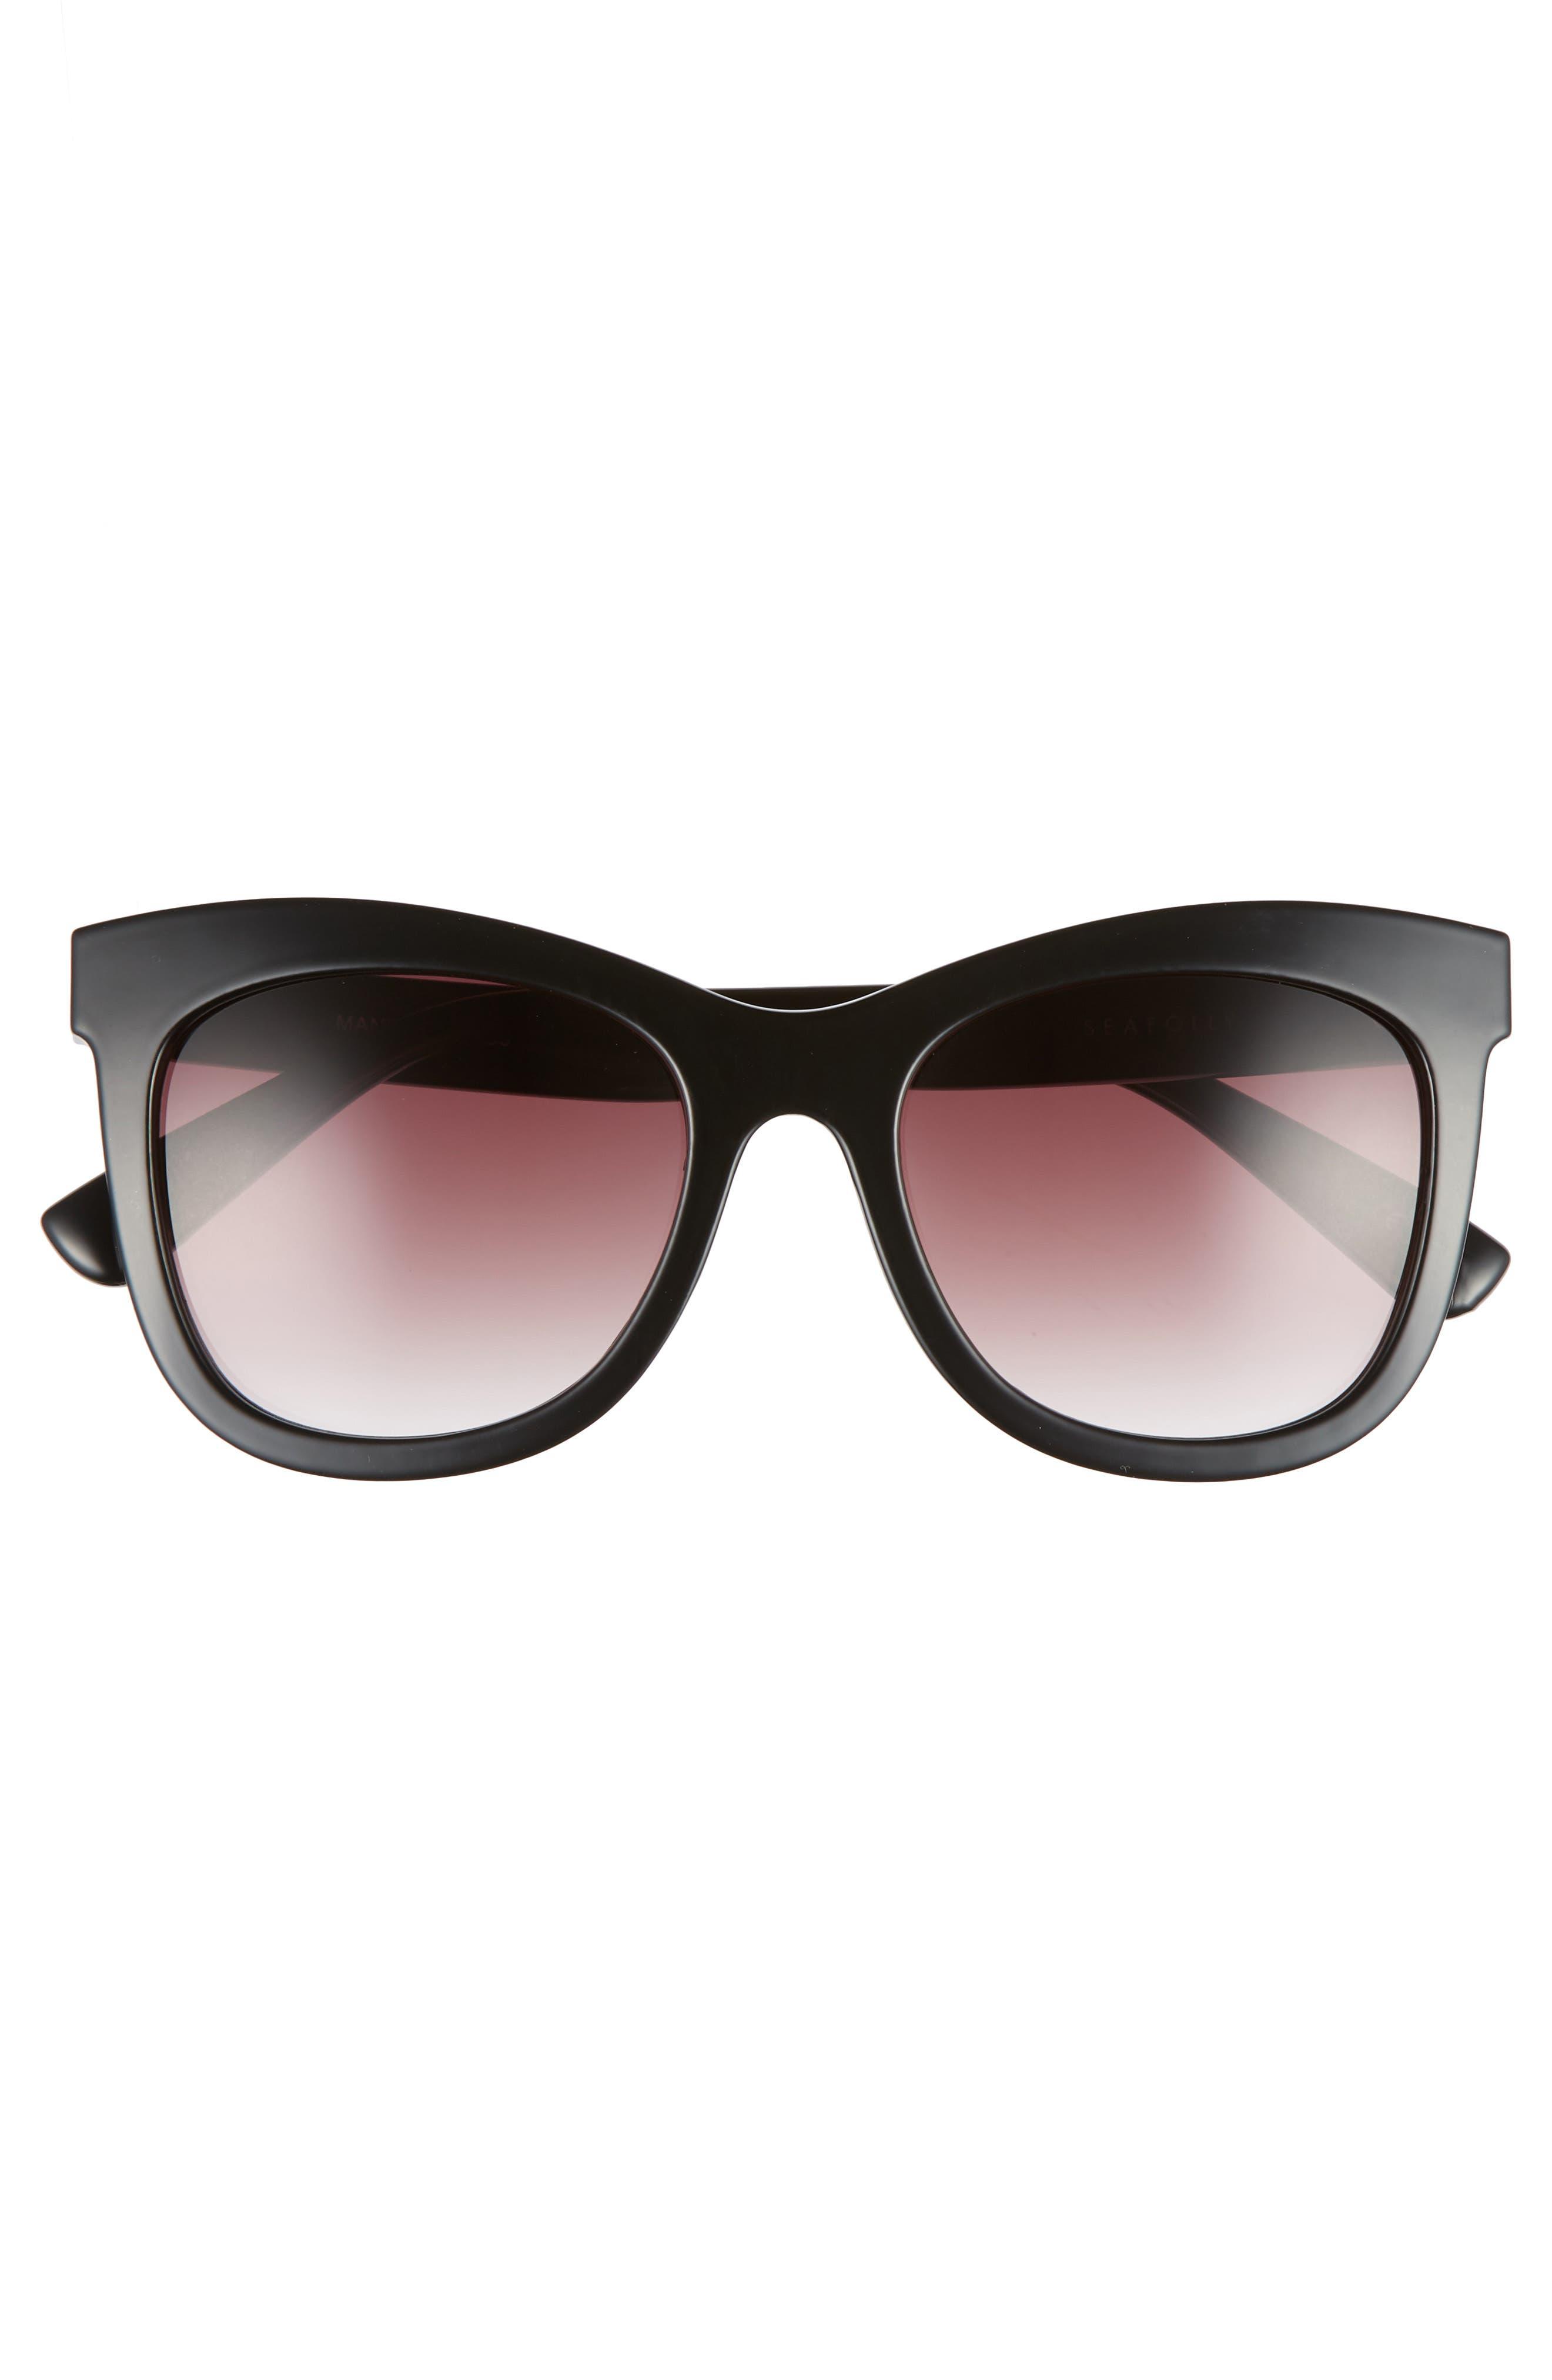 Manly 52mm Cat Eye Sunglasses,                             Alternate thumbnail 3, color,                             BLACK